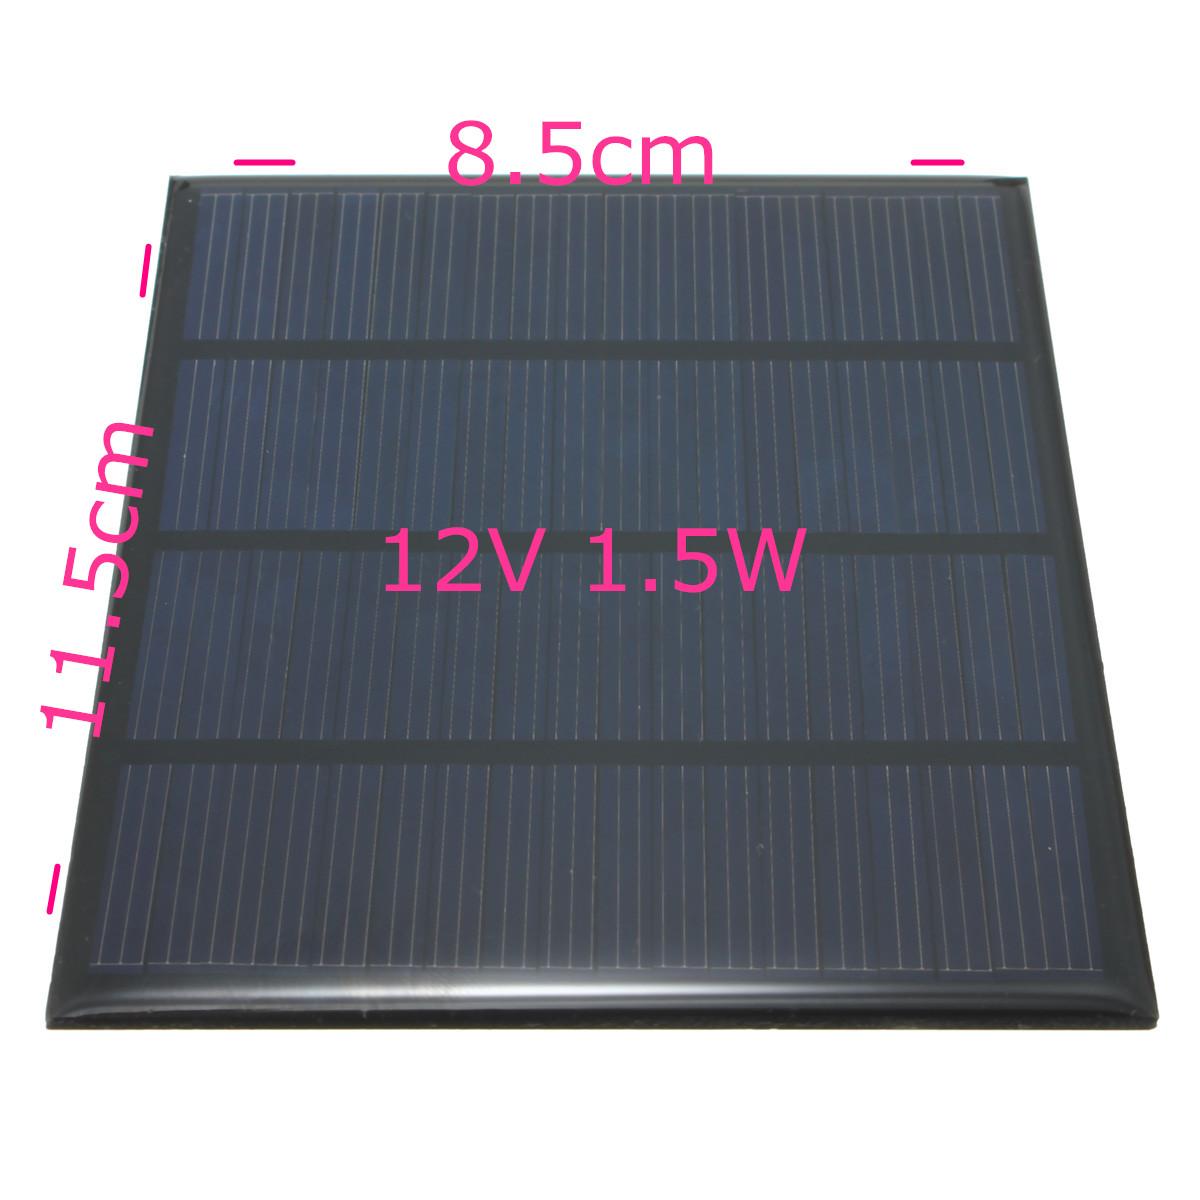 Elfeland 12v Solarpanel Solarmodul Solarzelle